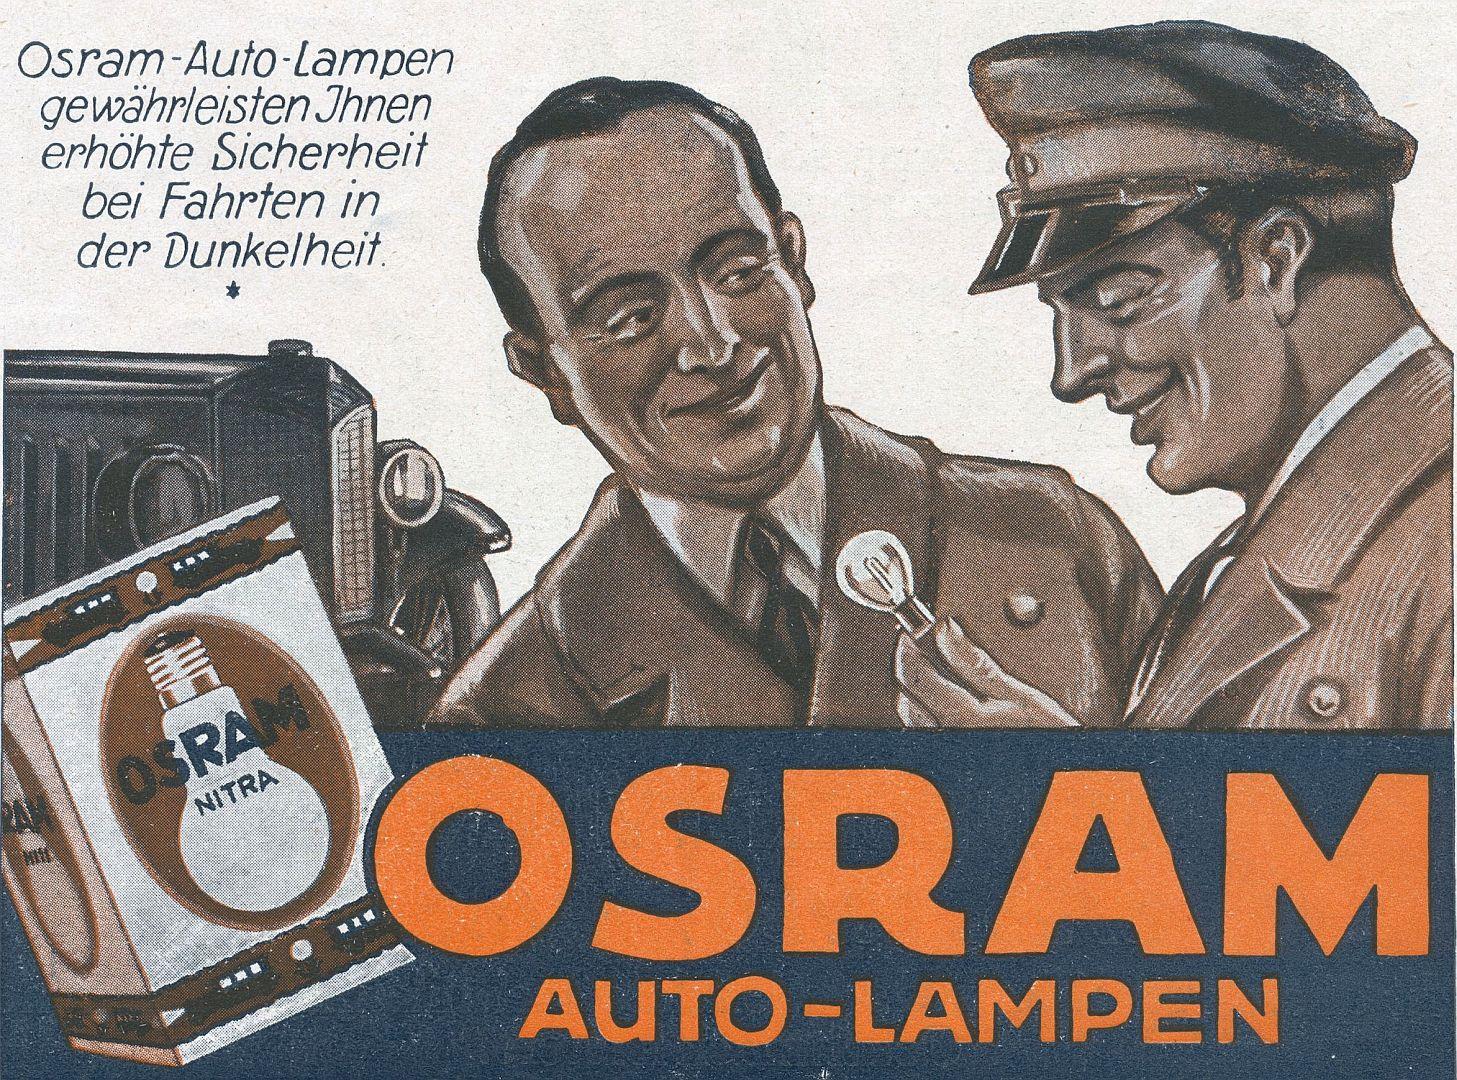 Protos_C-Typ_Osram-Reklame_datiert_1926_Galerie